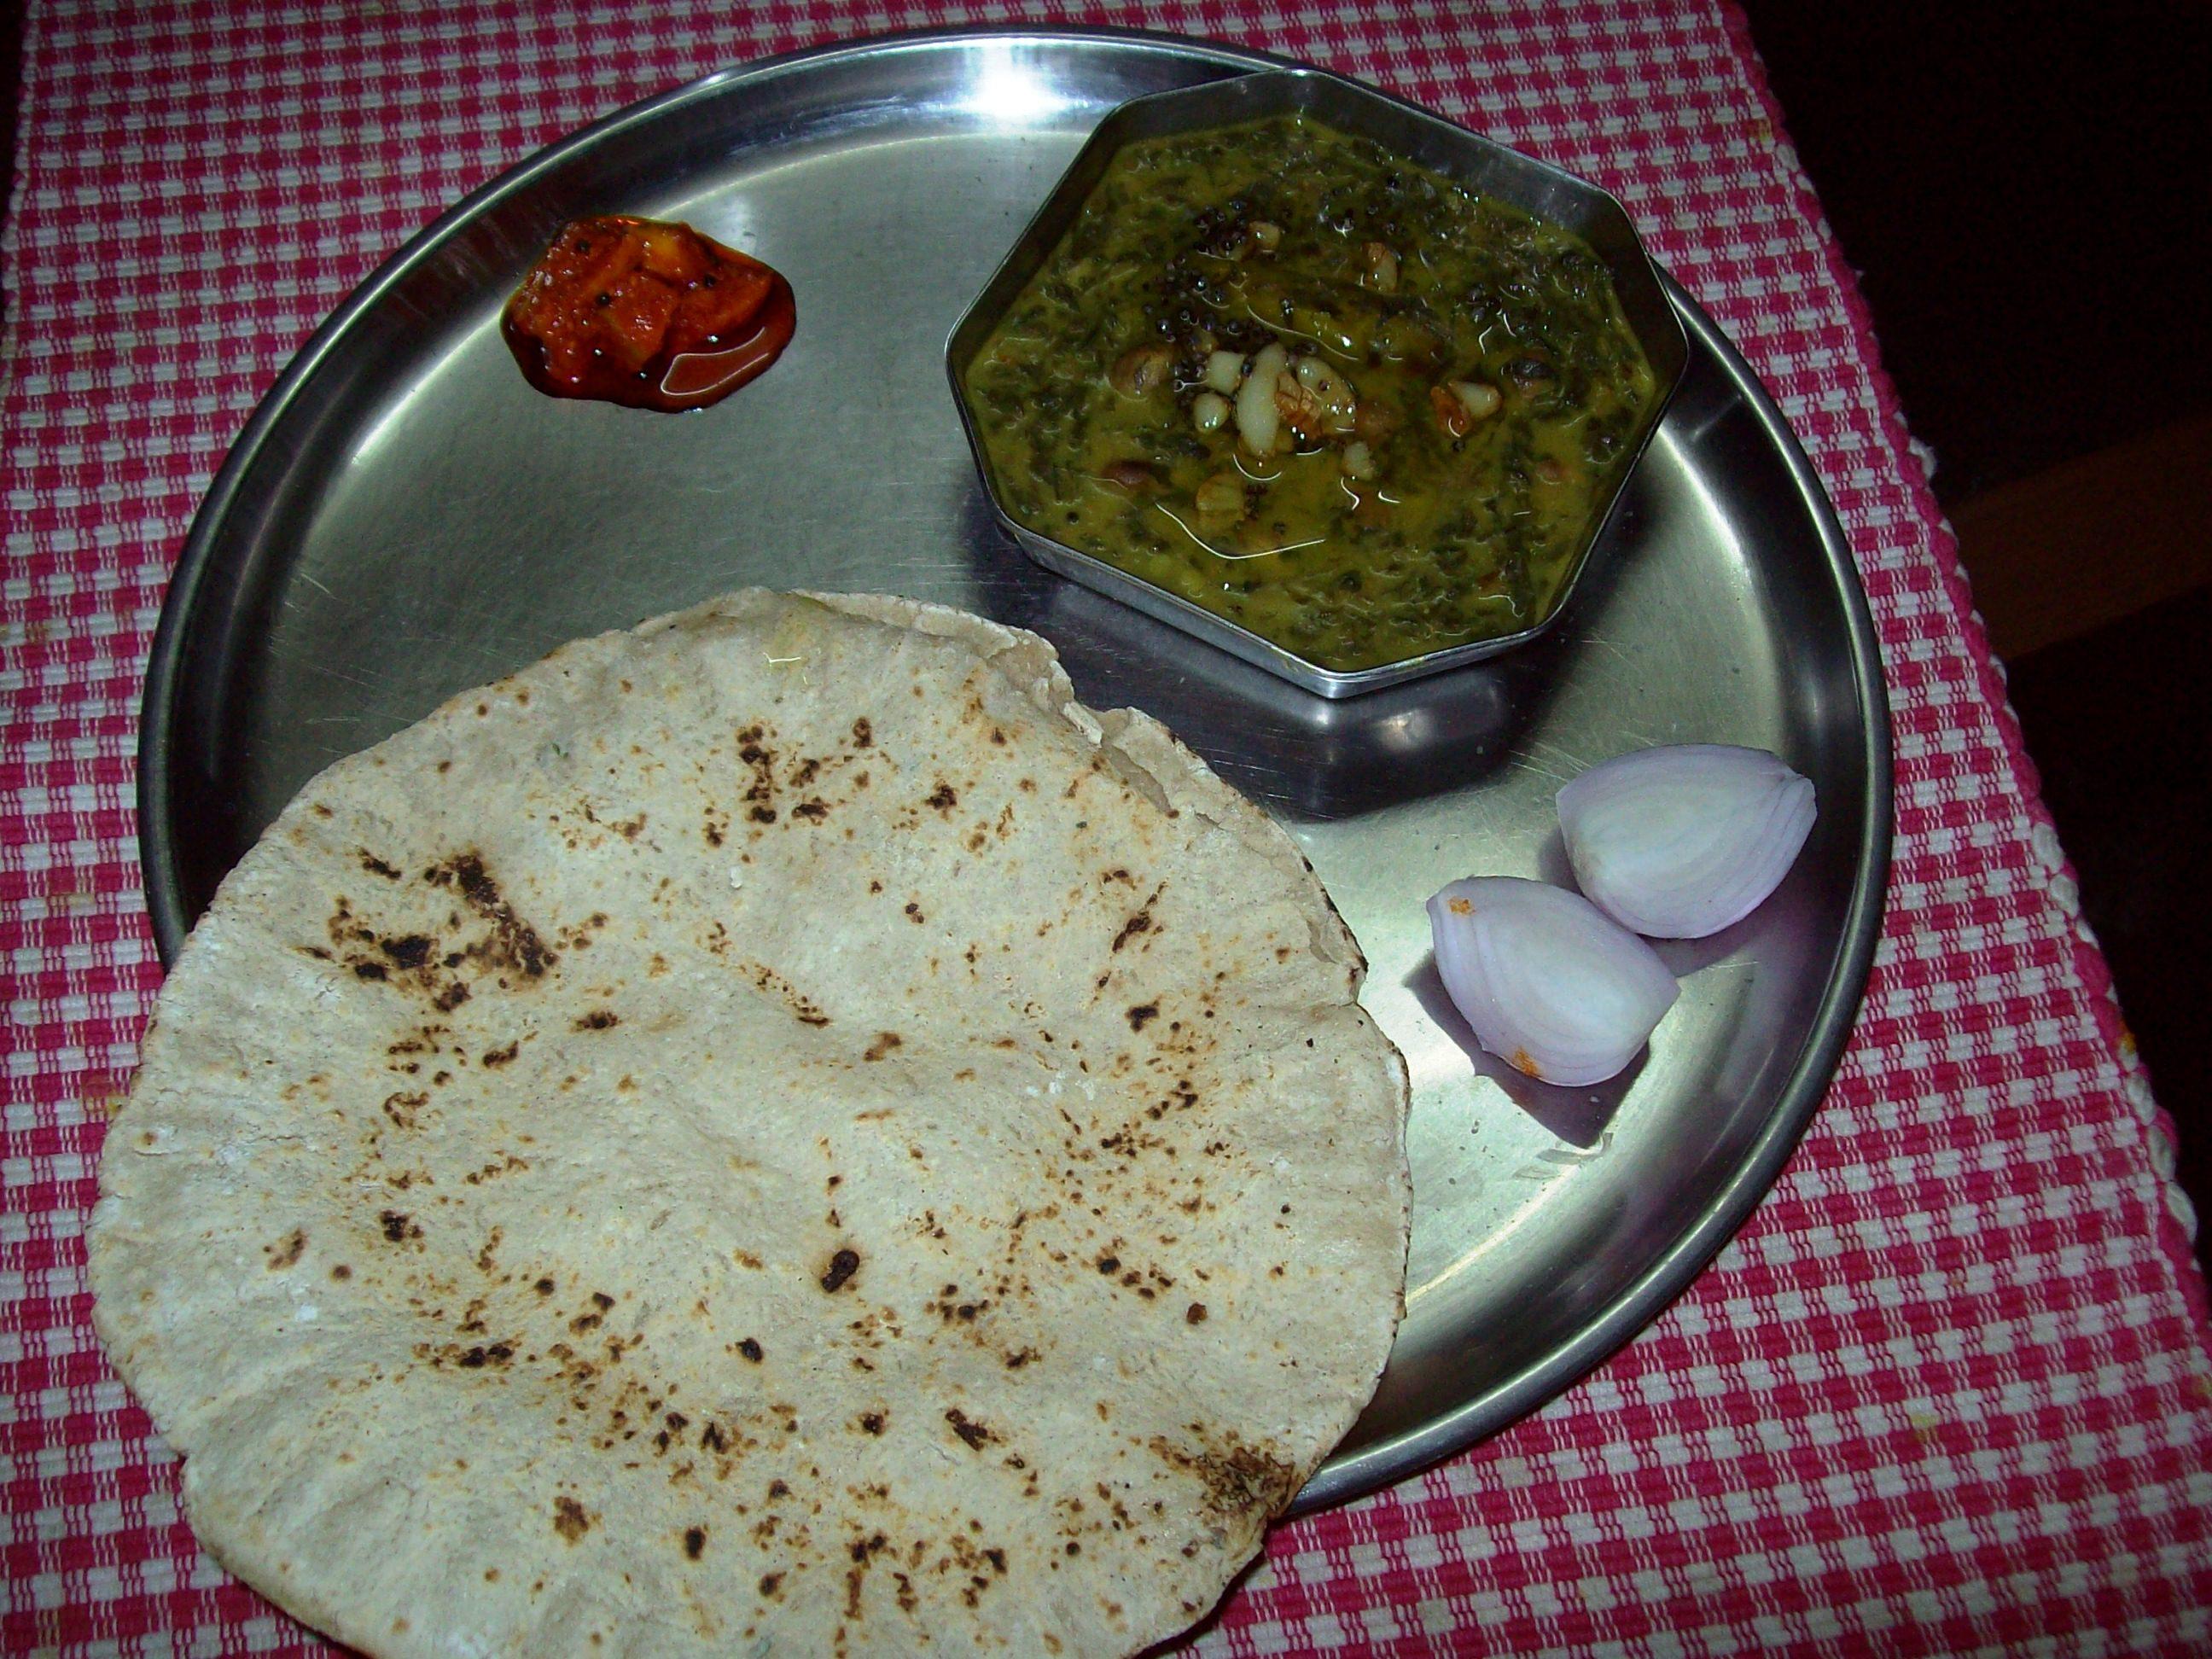 essay on my favourite festival diwali in marathi Bbc homework help ks2 essay on my favourite country law school  on my favourite country india in marathi a  favorite festival diwali : essay.